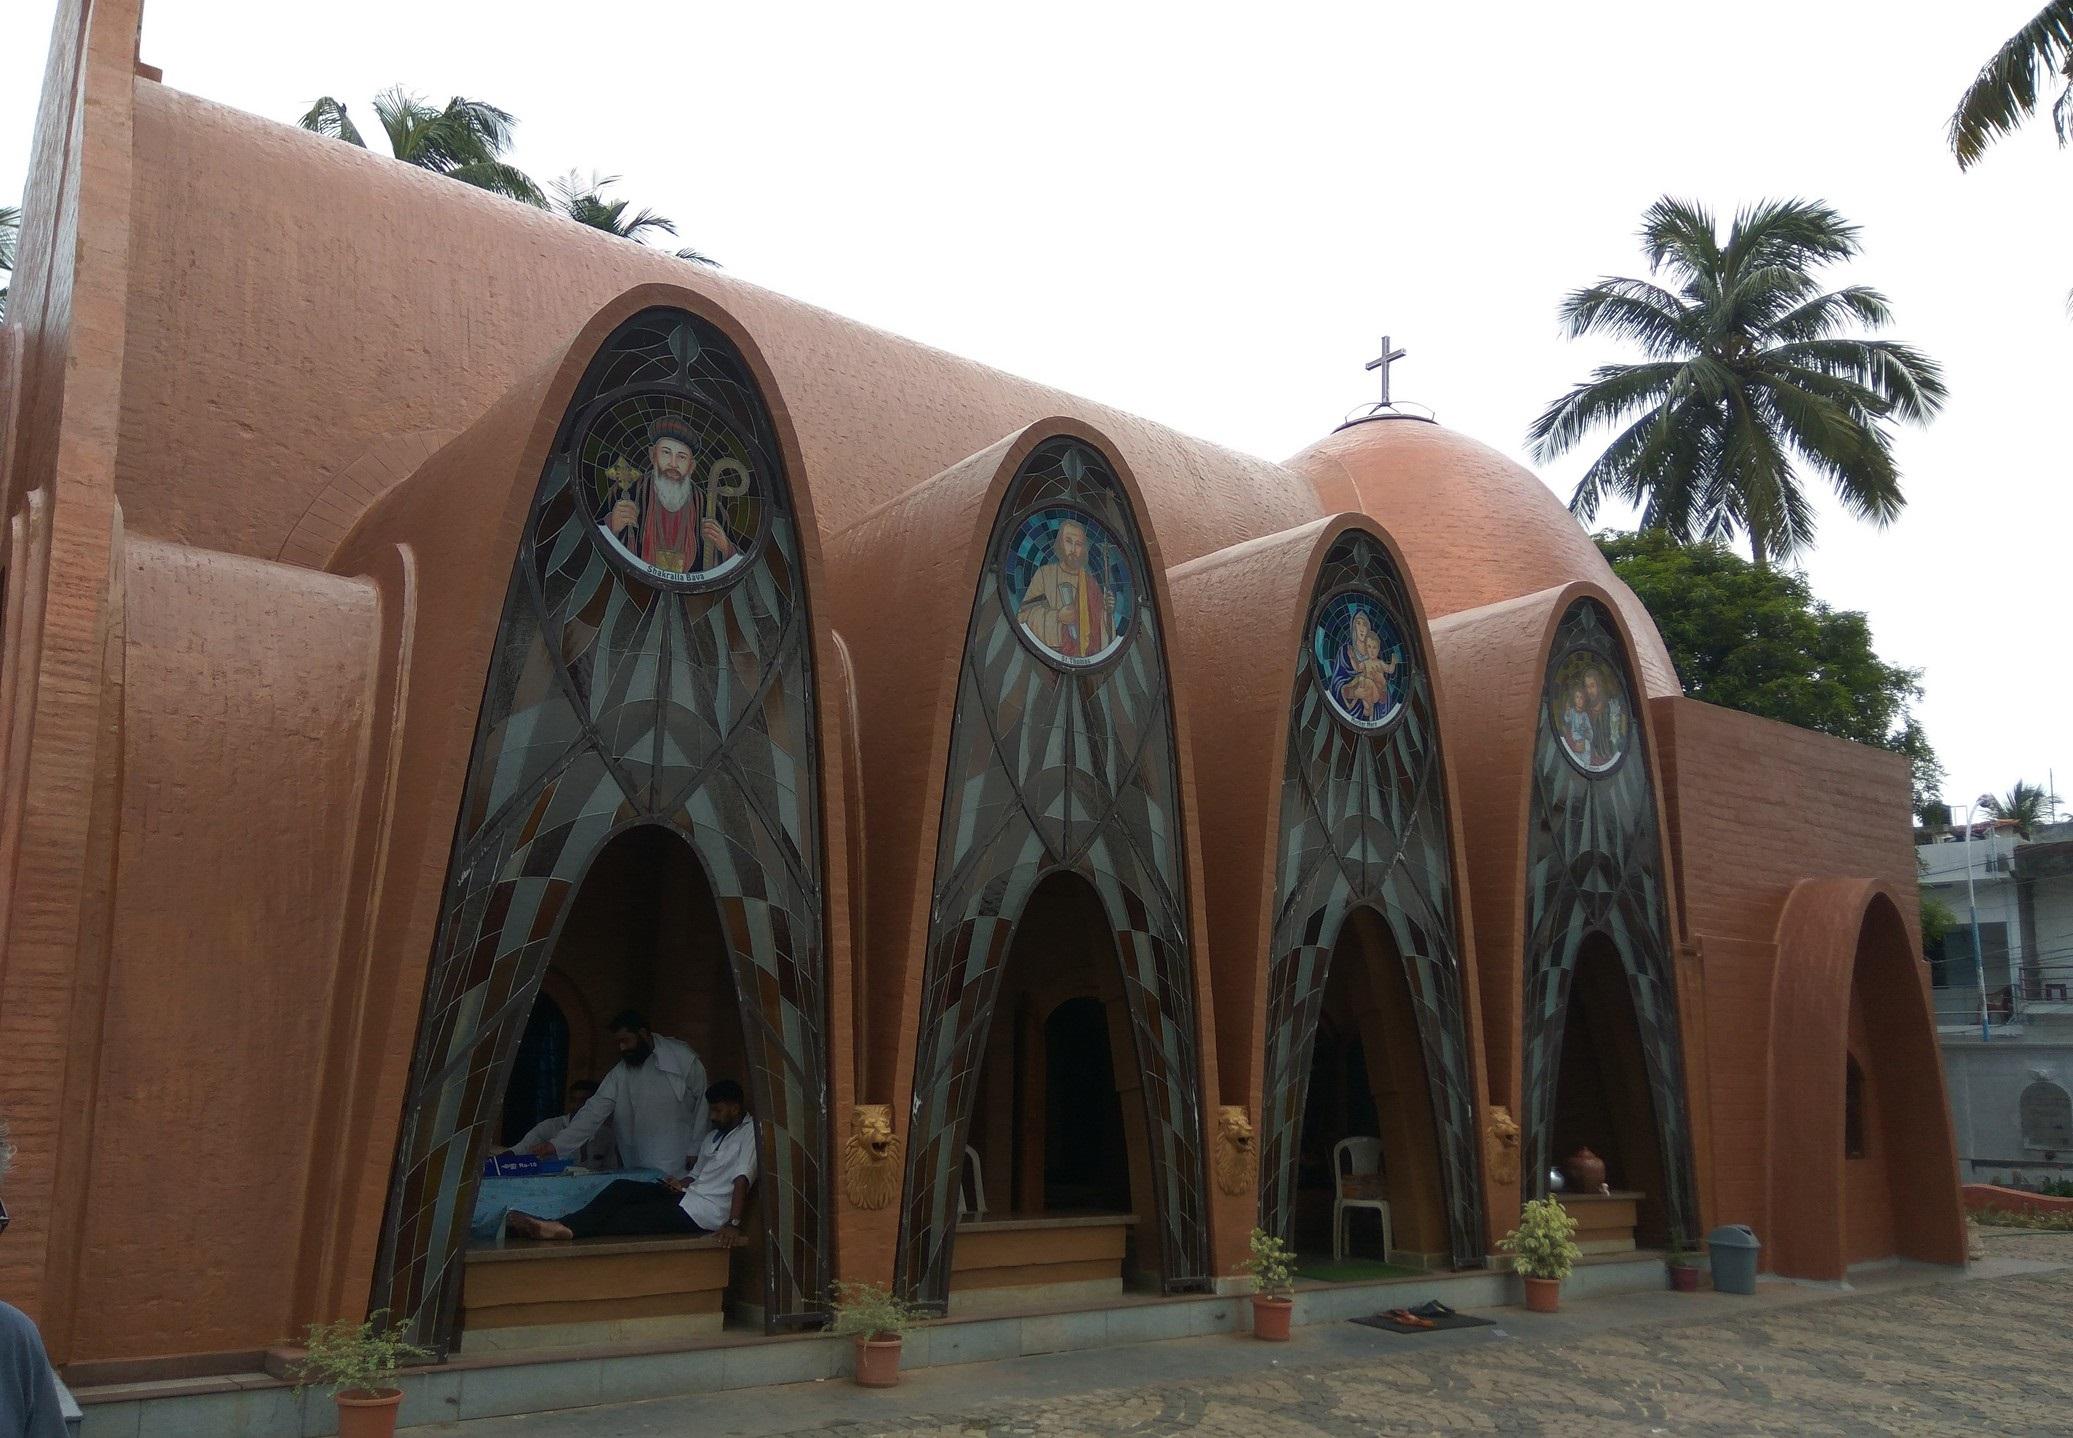 Koonan Kurishu church in Kochi Sightseeing Tour